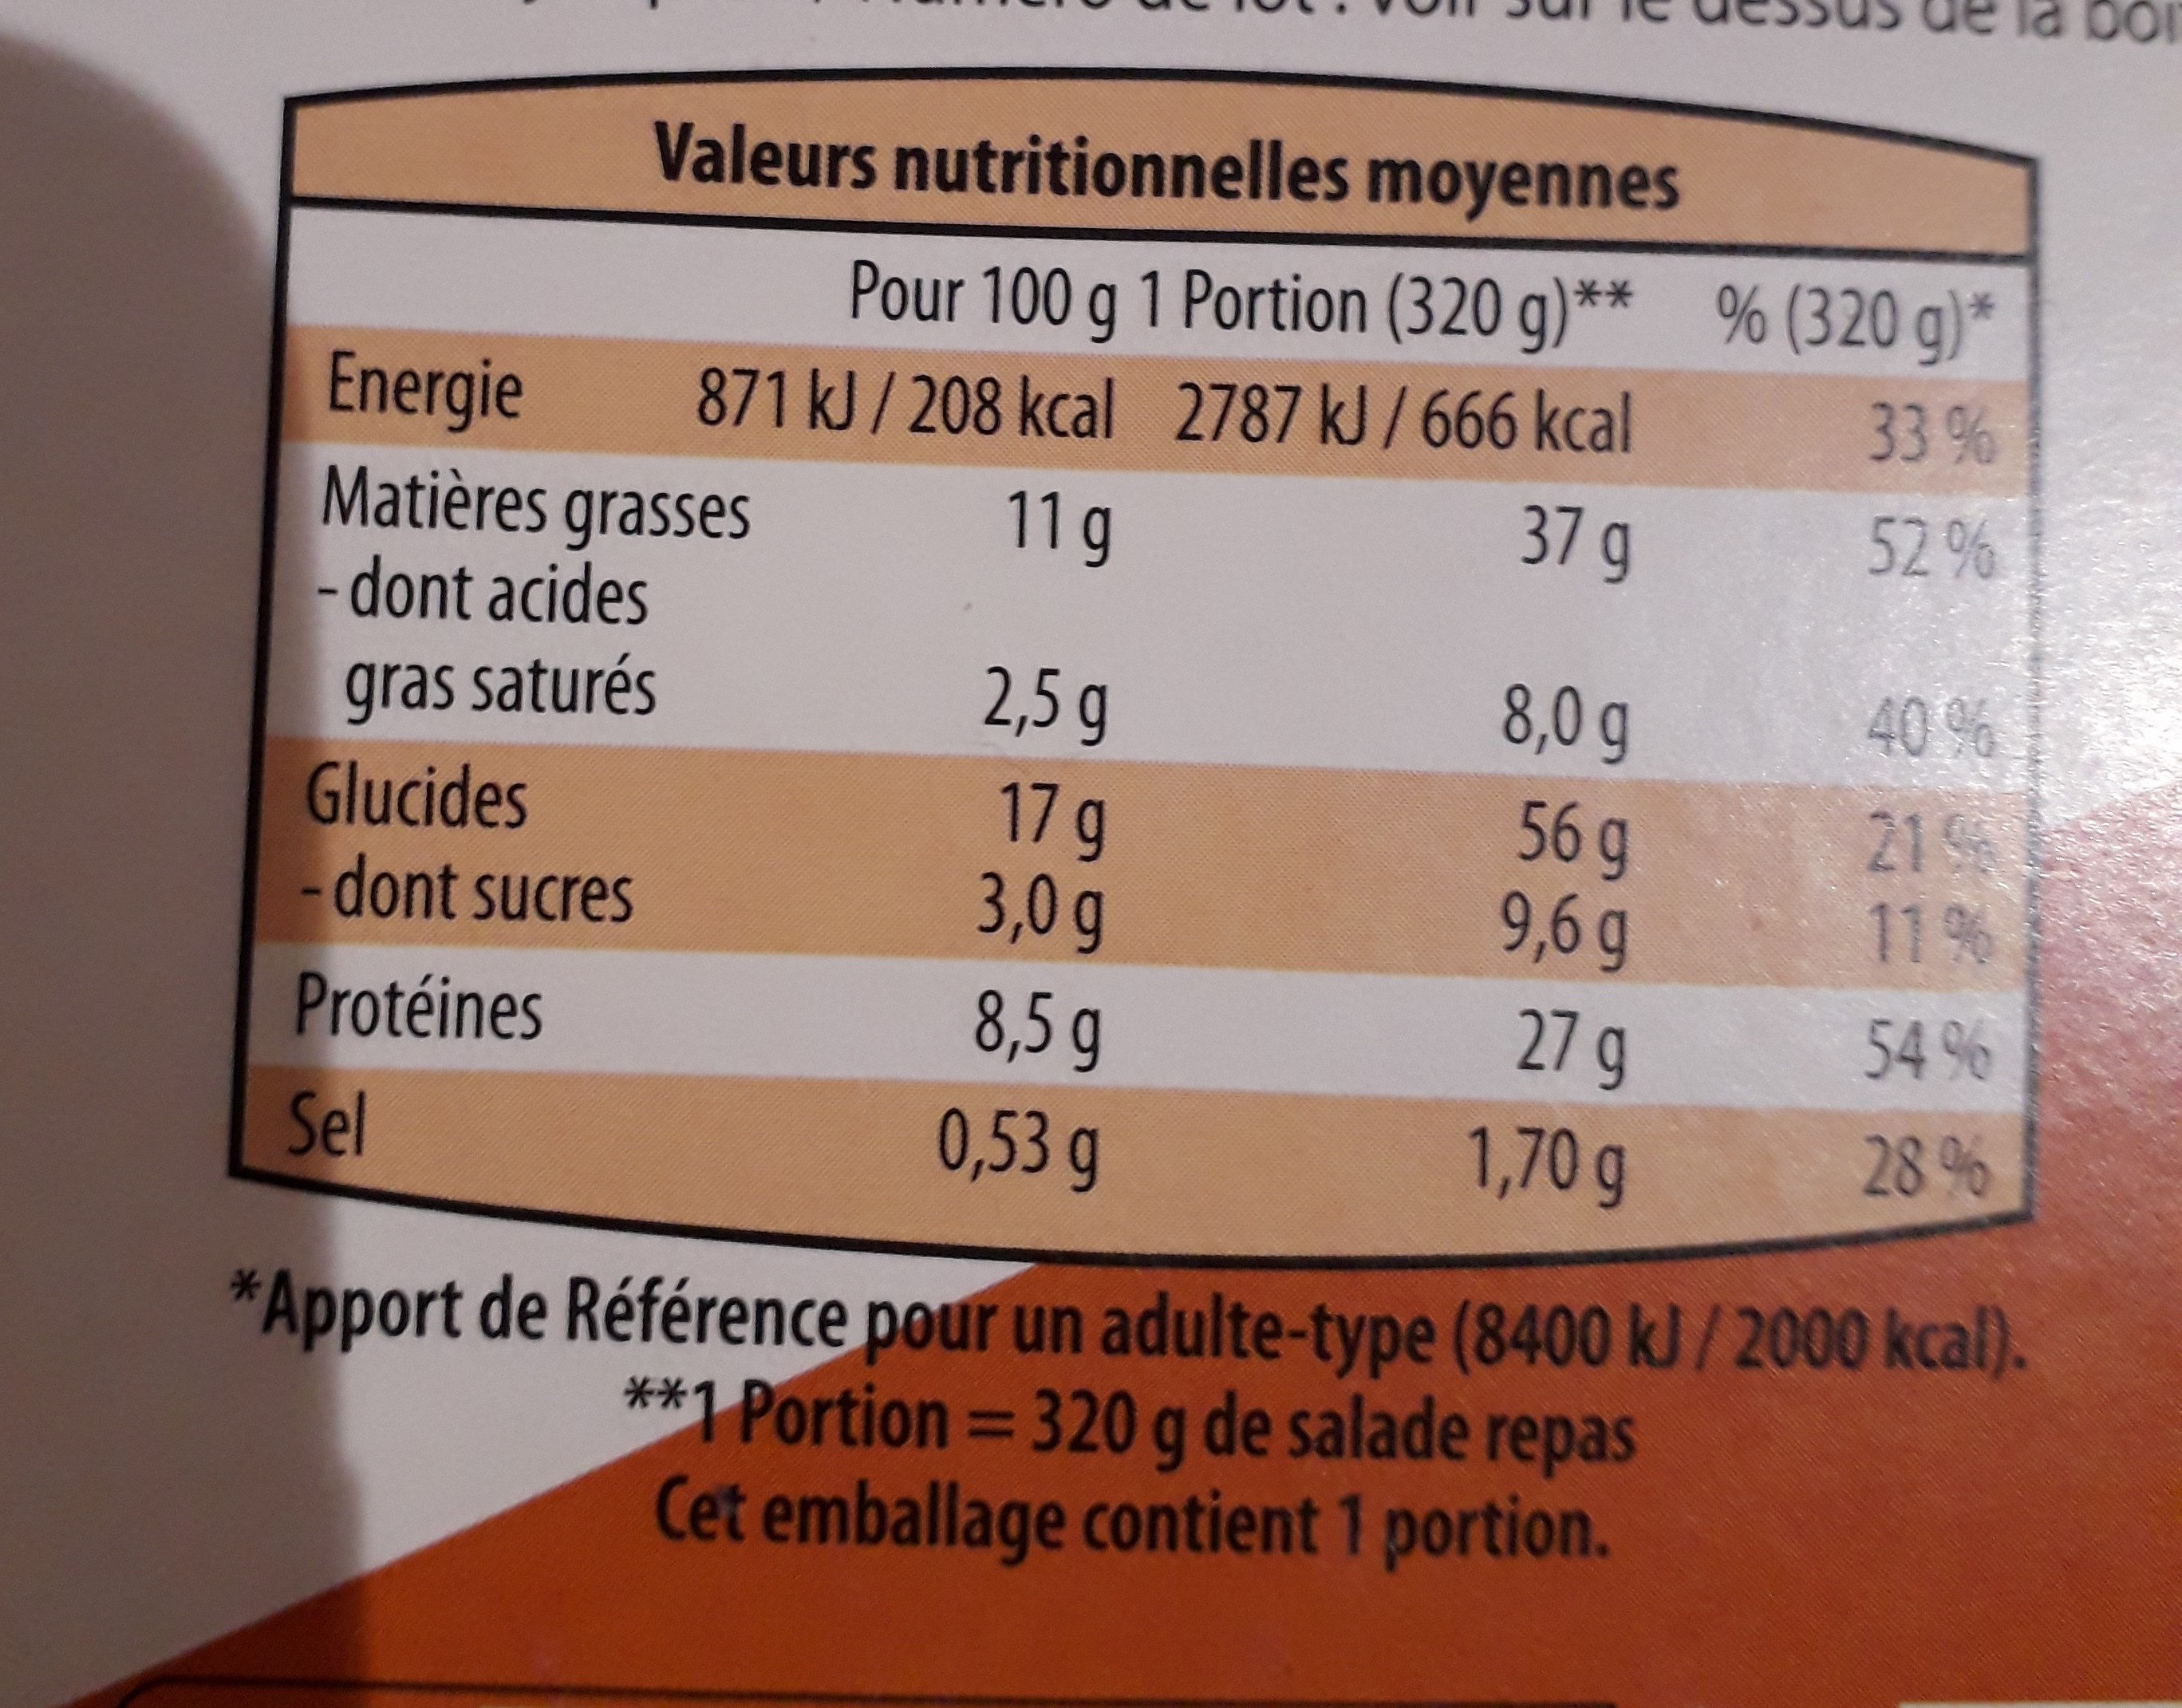 Salade jambon œuf emmental - Informations nutritionnelles